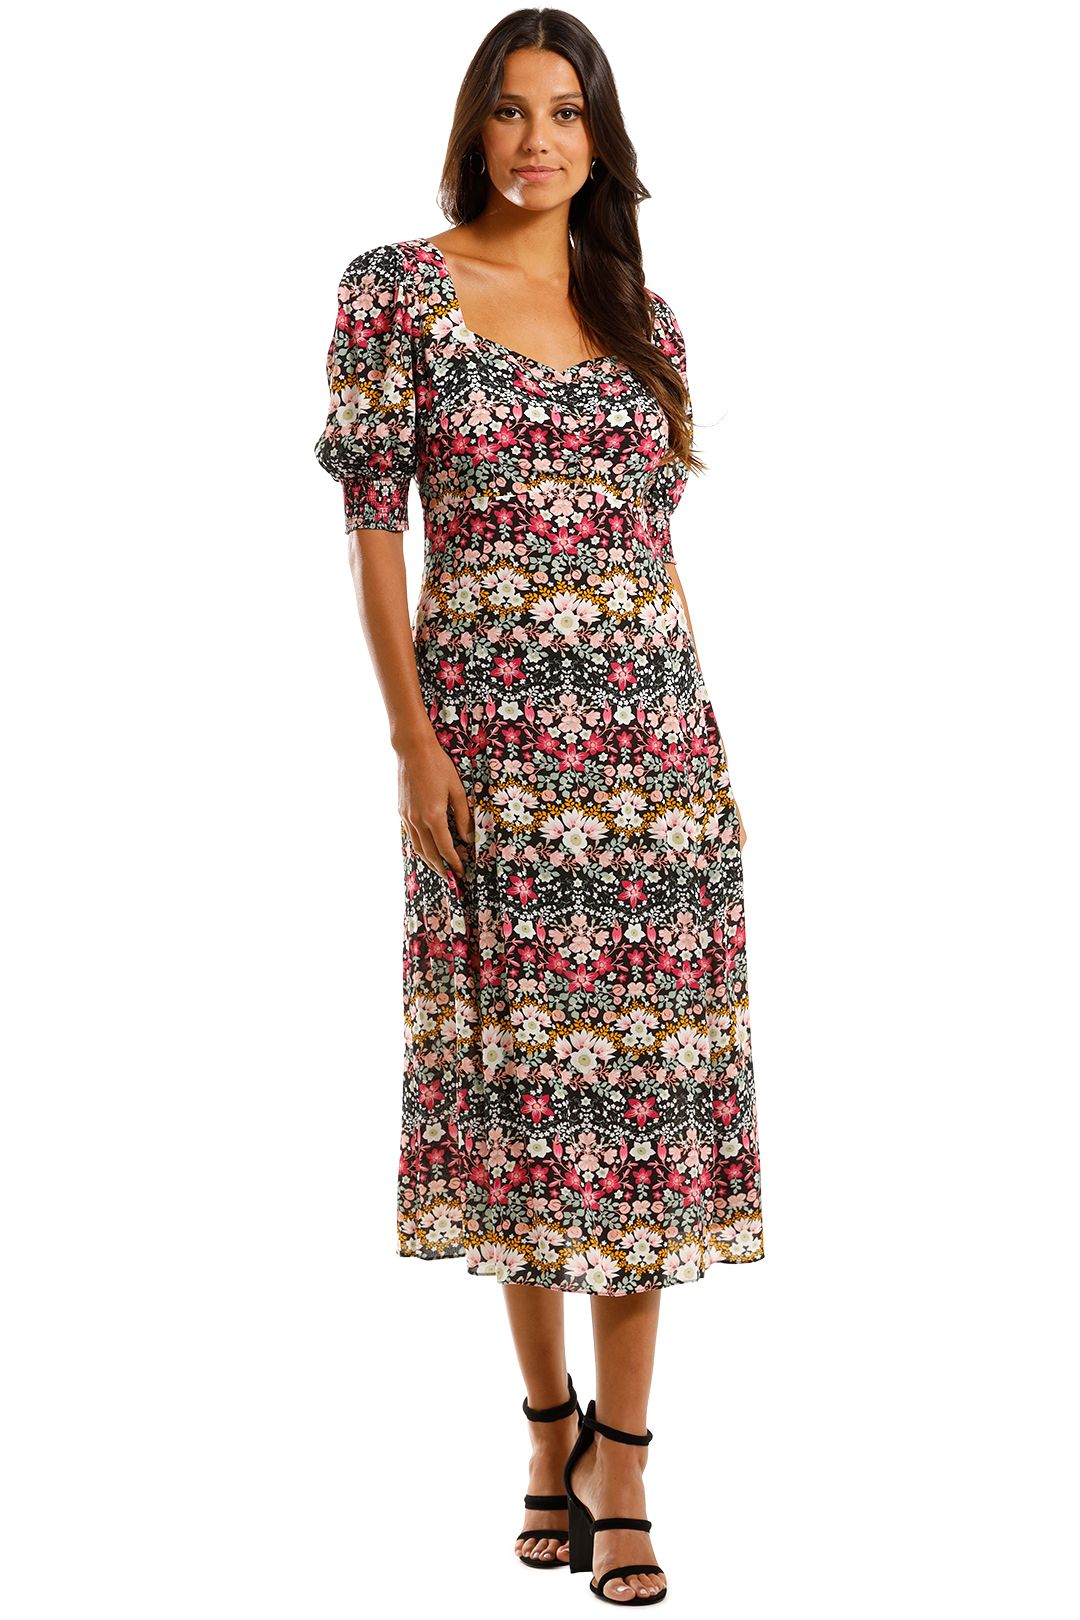 Kachel Leah Short Puff Sleeve Sweetheart Midi Dress Floral